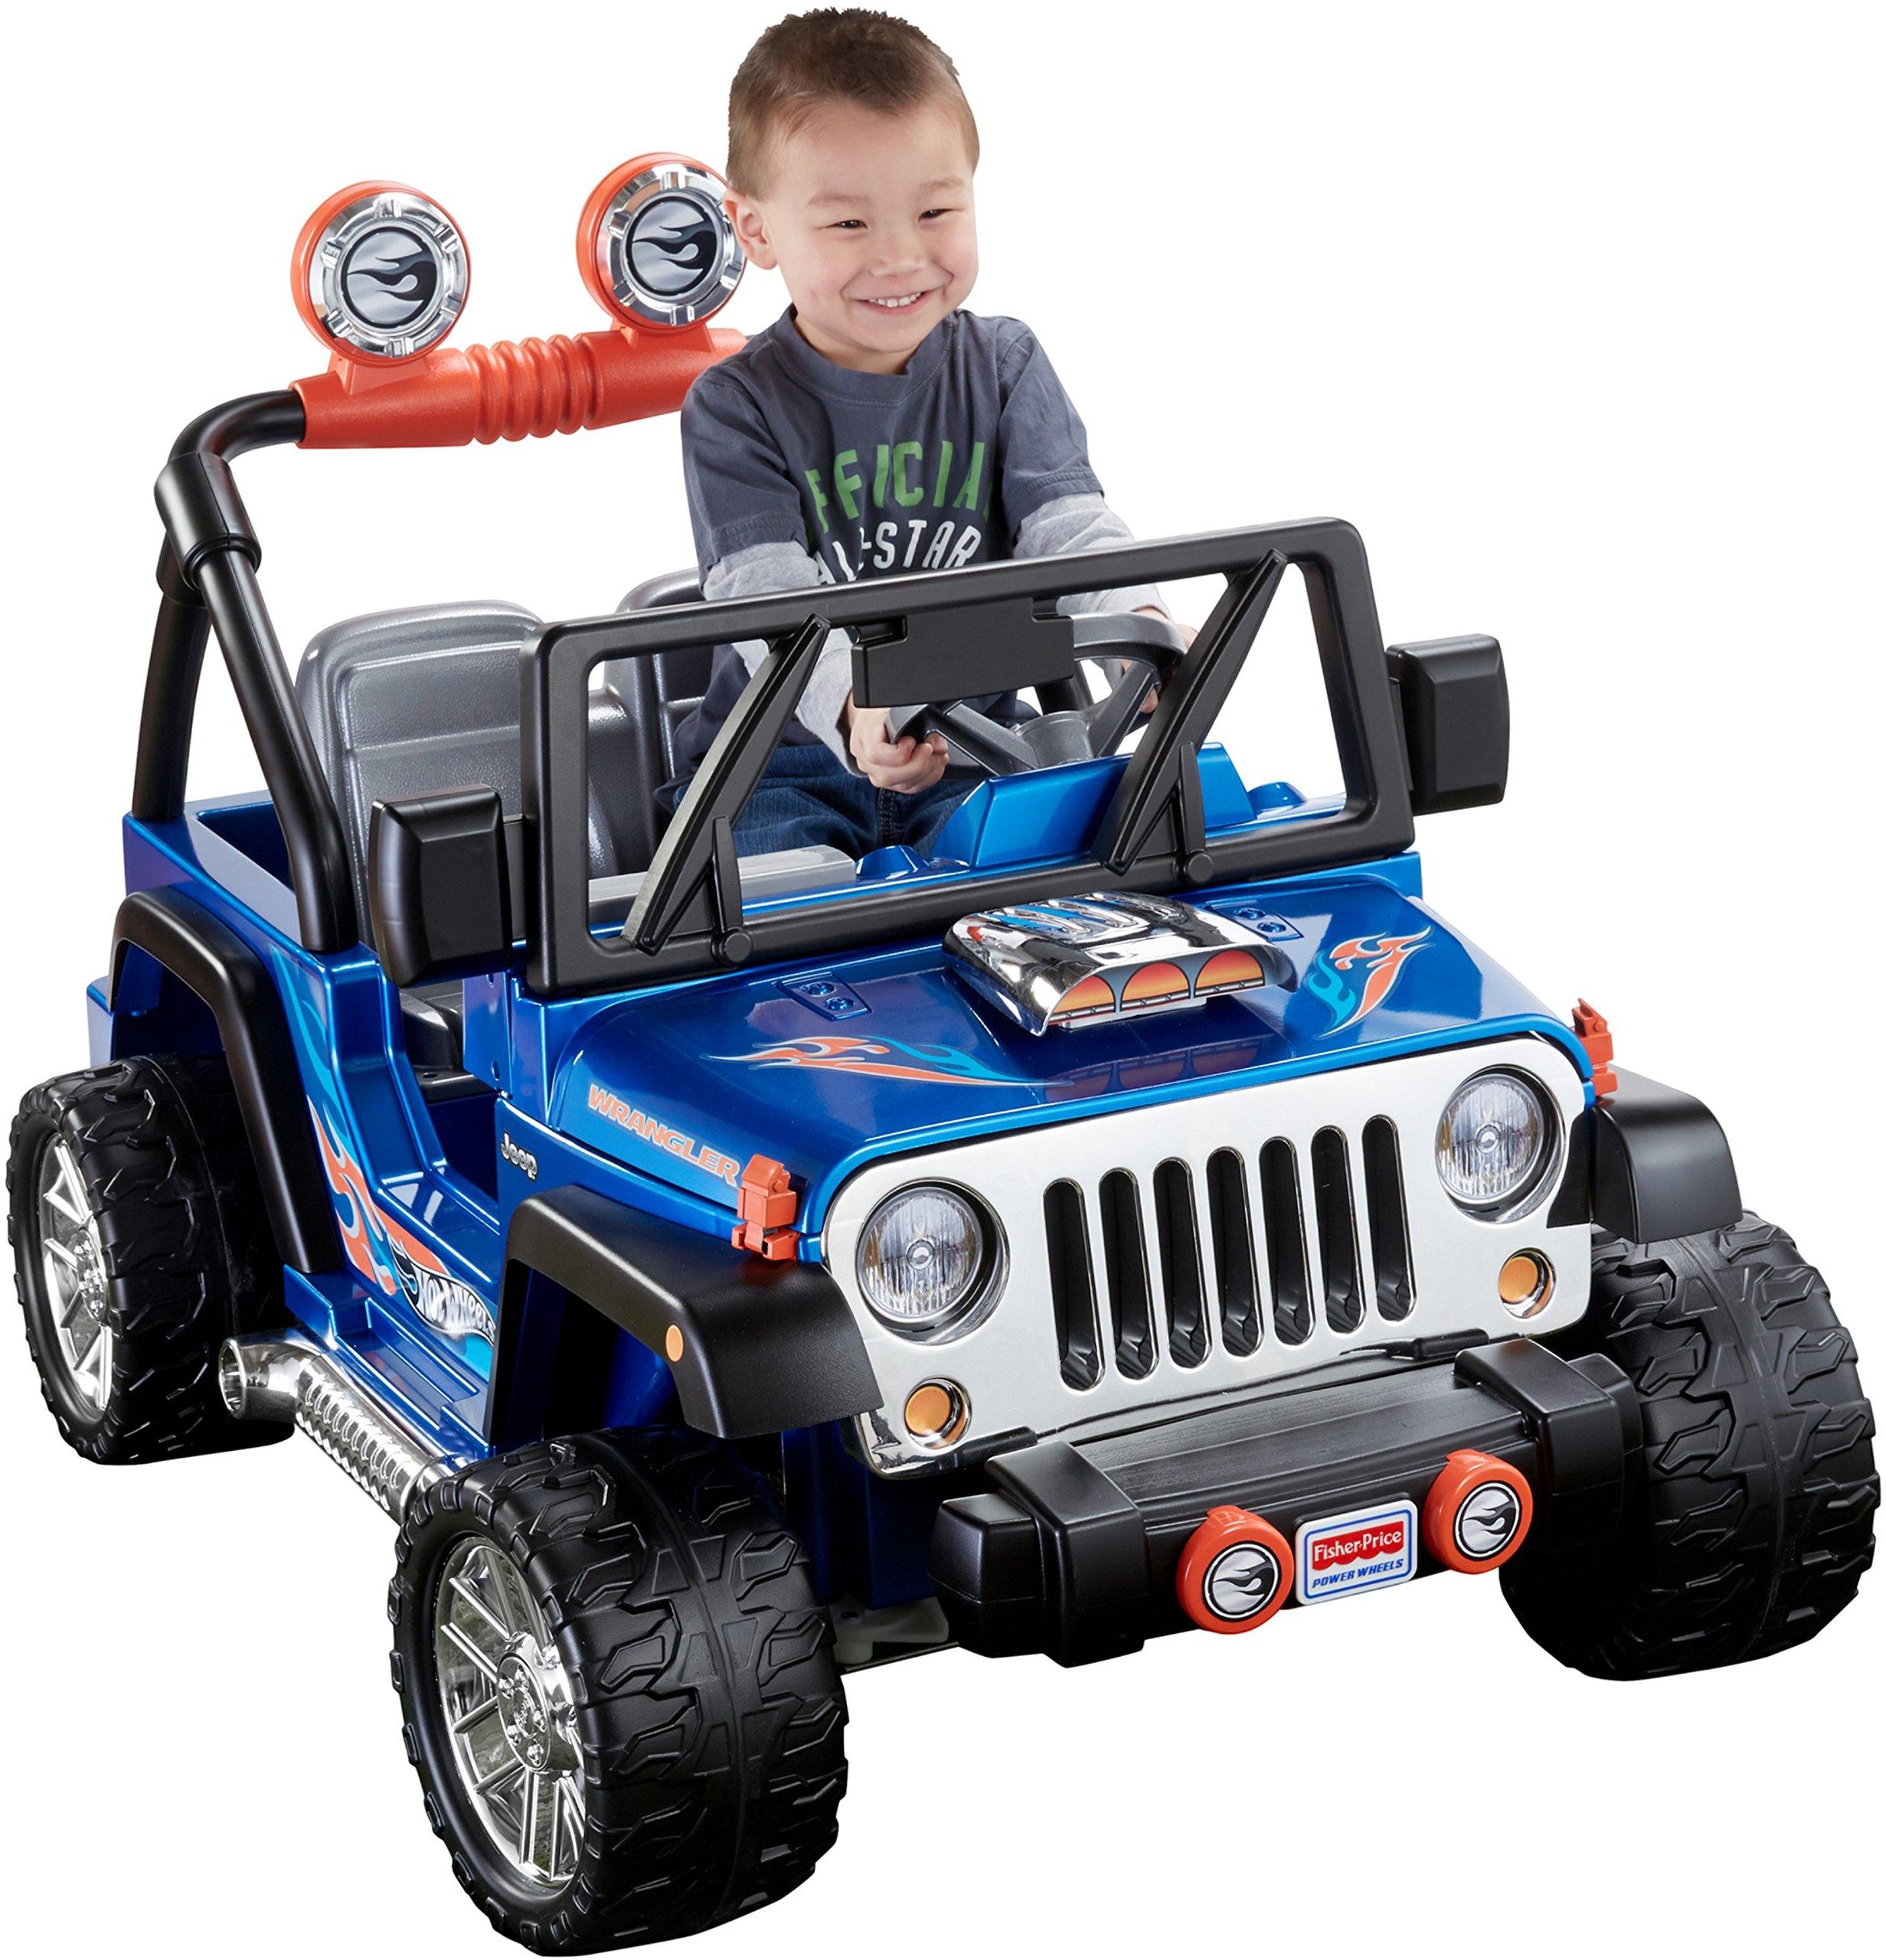 Power Wheels Hot Wheels Jeep Wrangler, Blue (12V) by Power Wheels